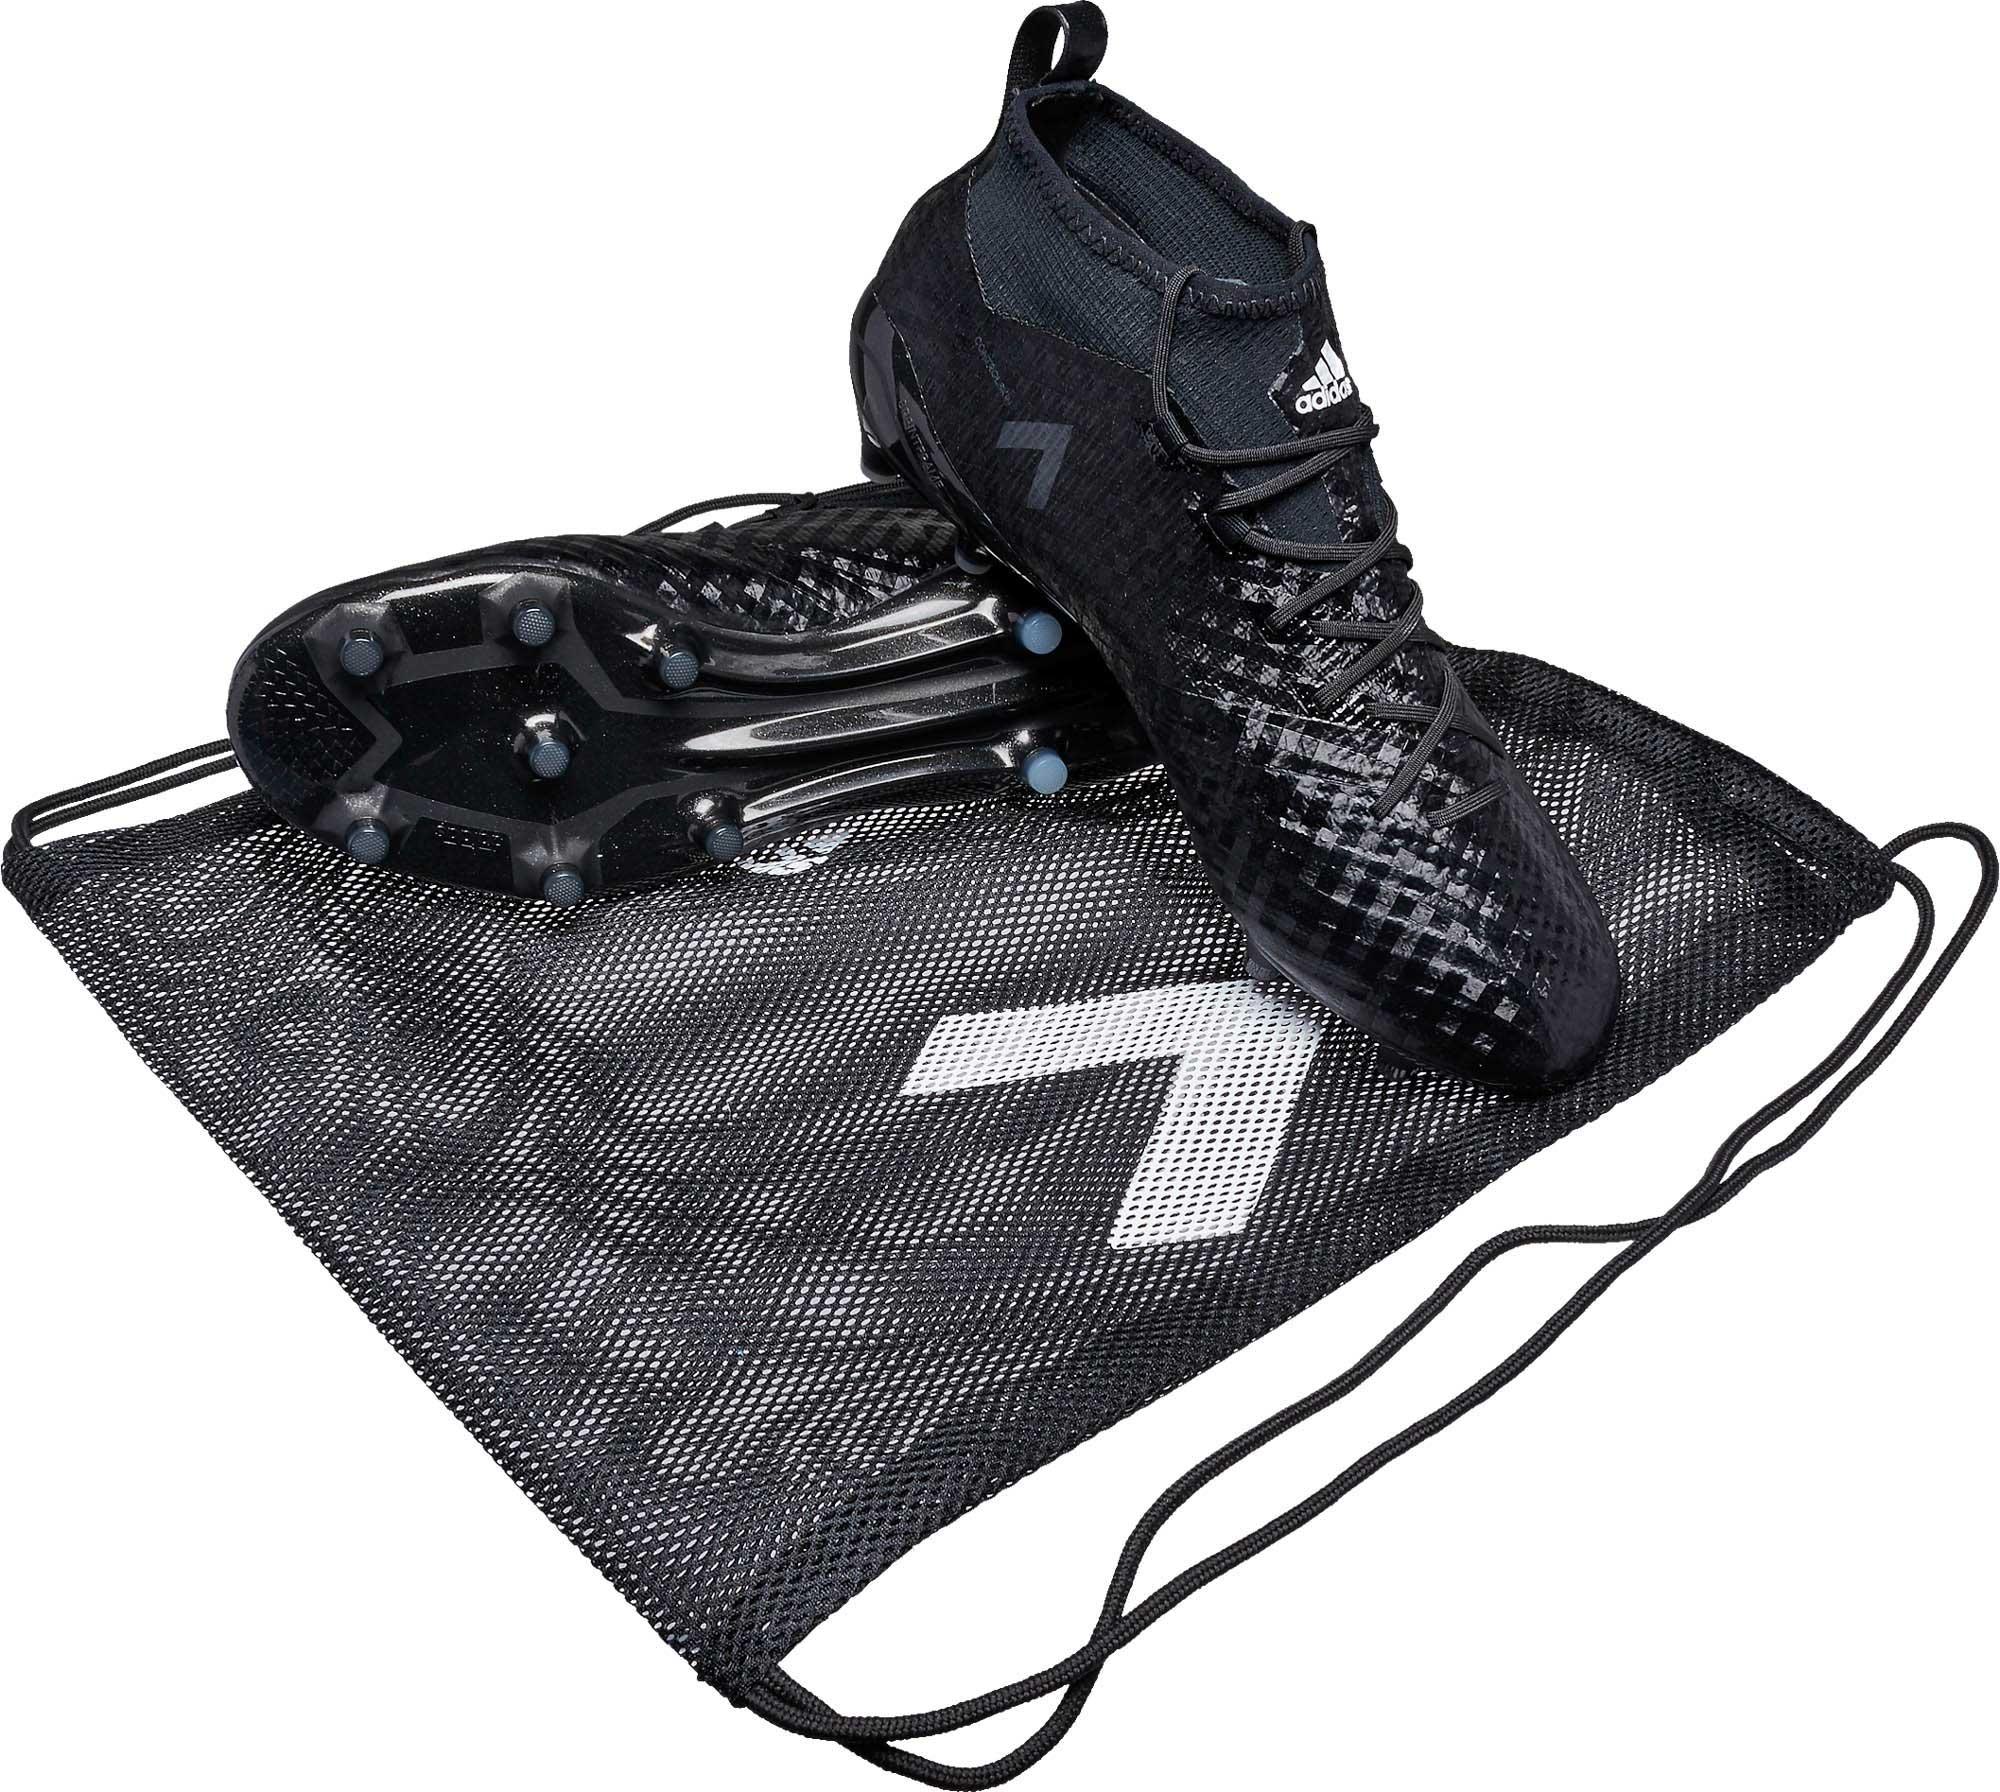 finest selection 4b23c d9e02 adidas ACE 17.1 Primeknit FG – BlackNight Metallic